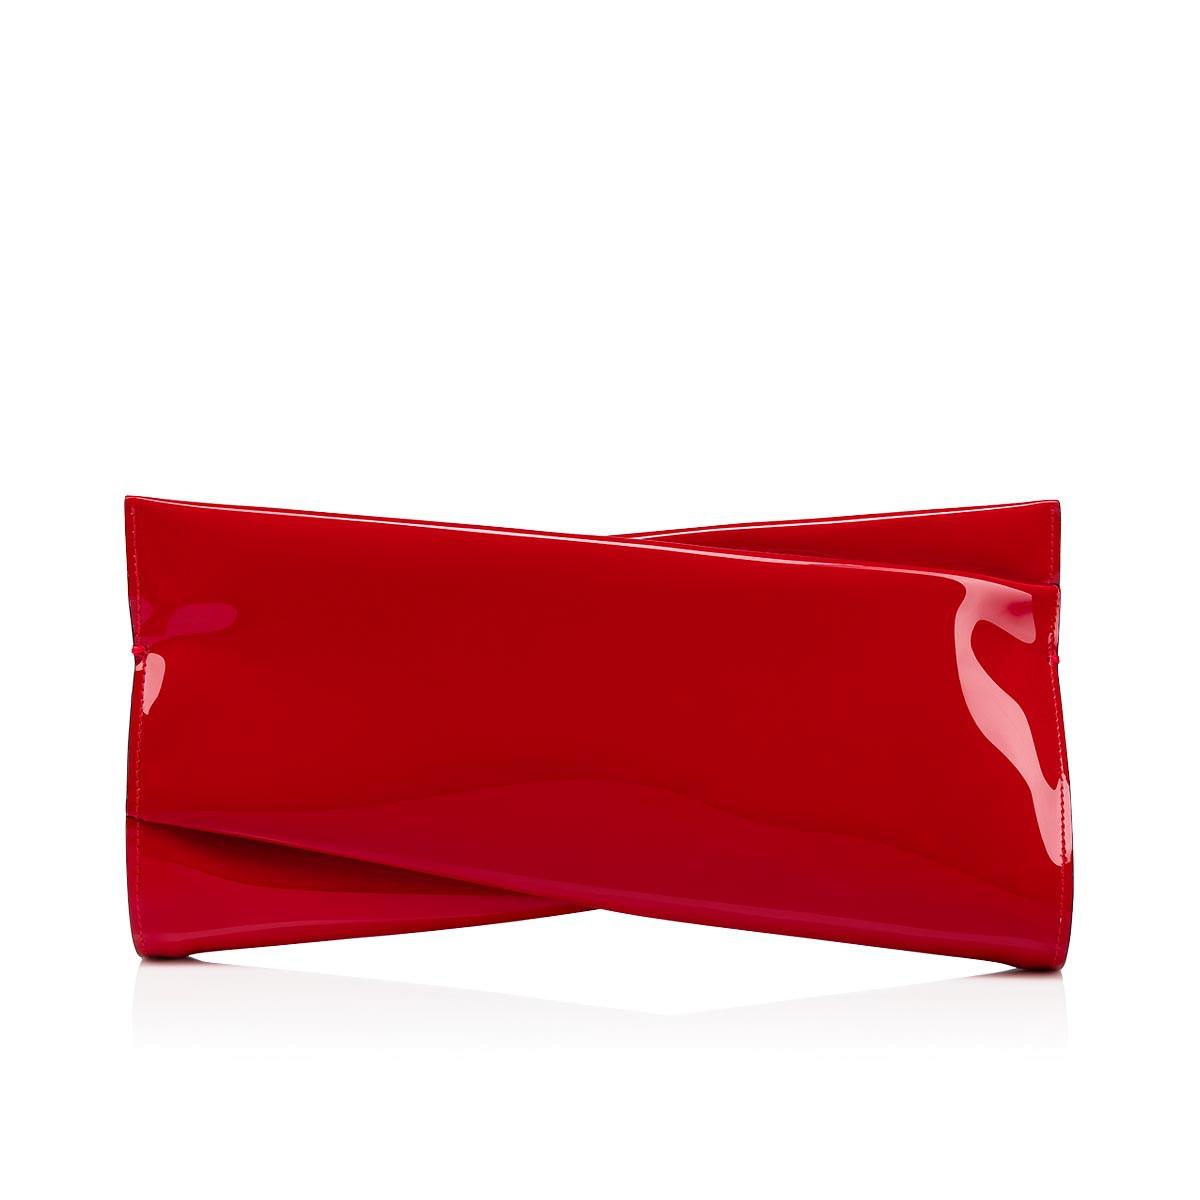 Bags - Loubitwist Clutch - Christian Louboutin